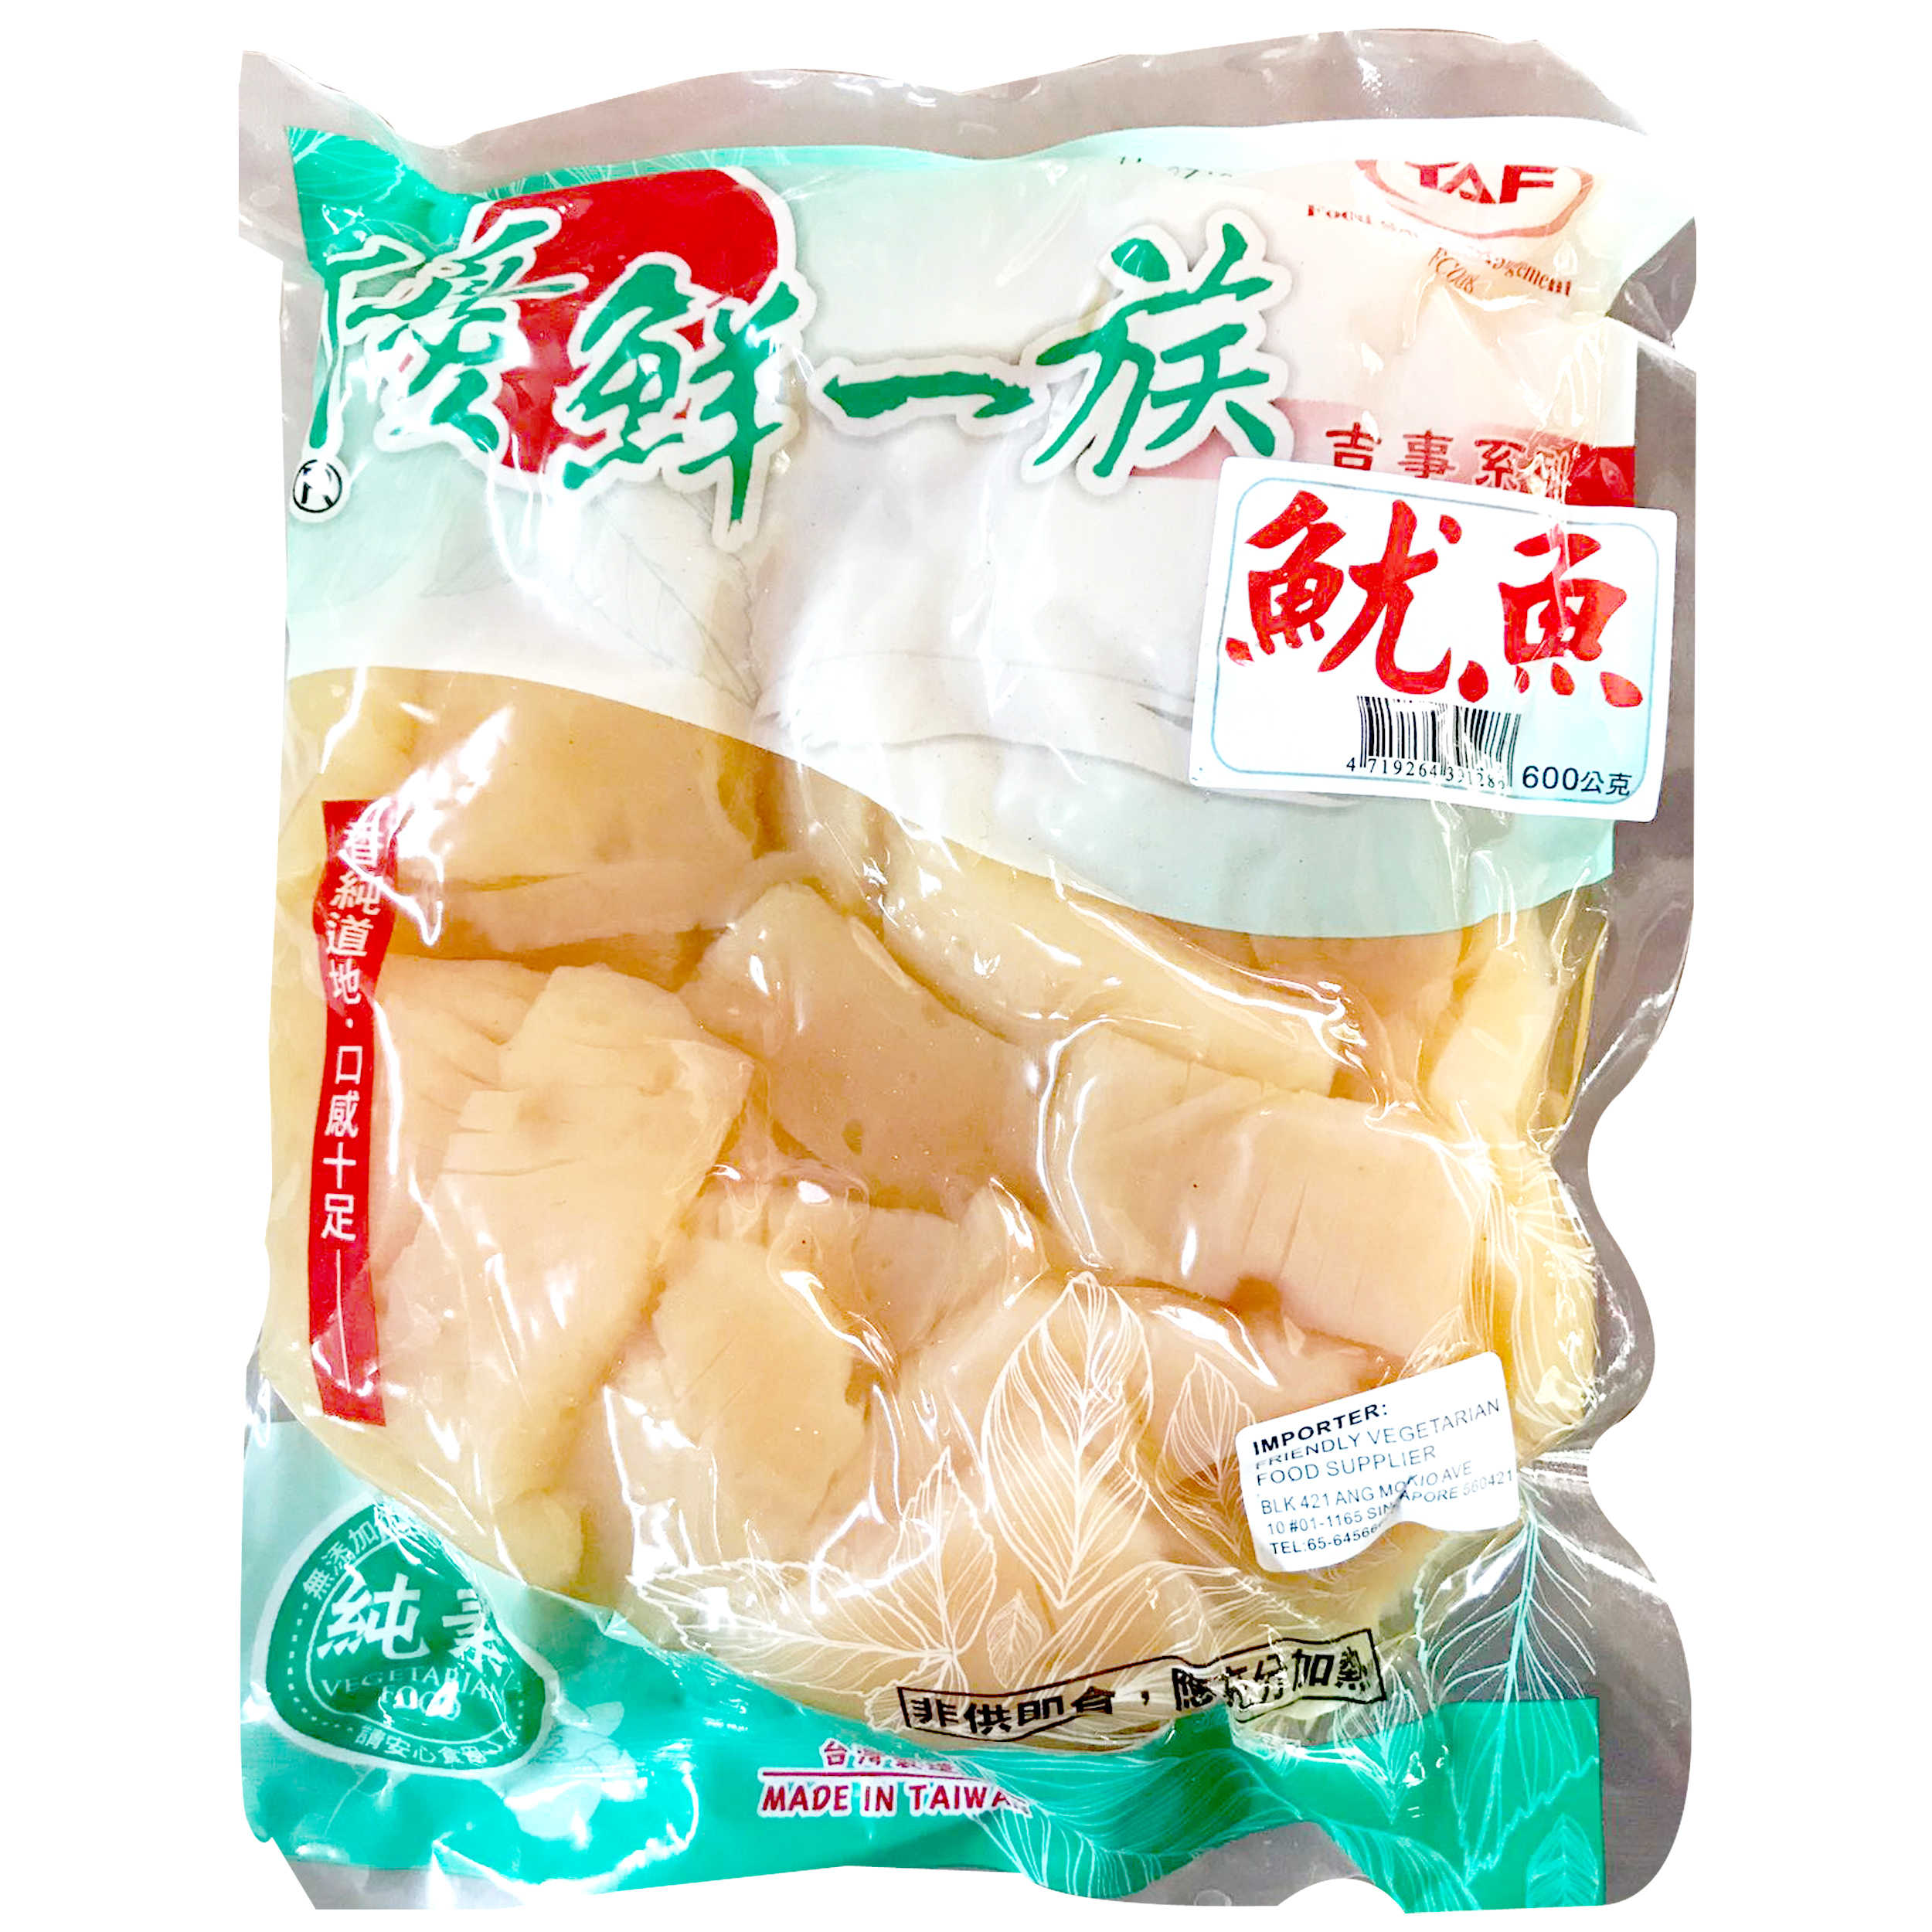 Image Vegetarian Cuttlefish 600grams 一麟 - 优鲜一 族 鱿鱼片 尤鱼 600grams